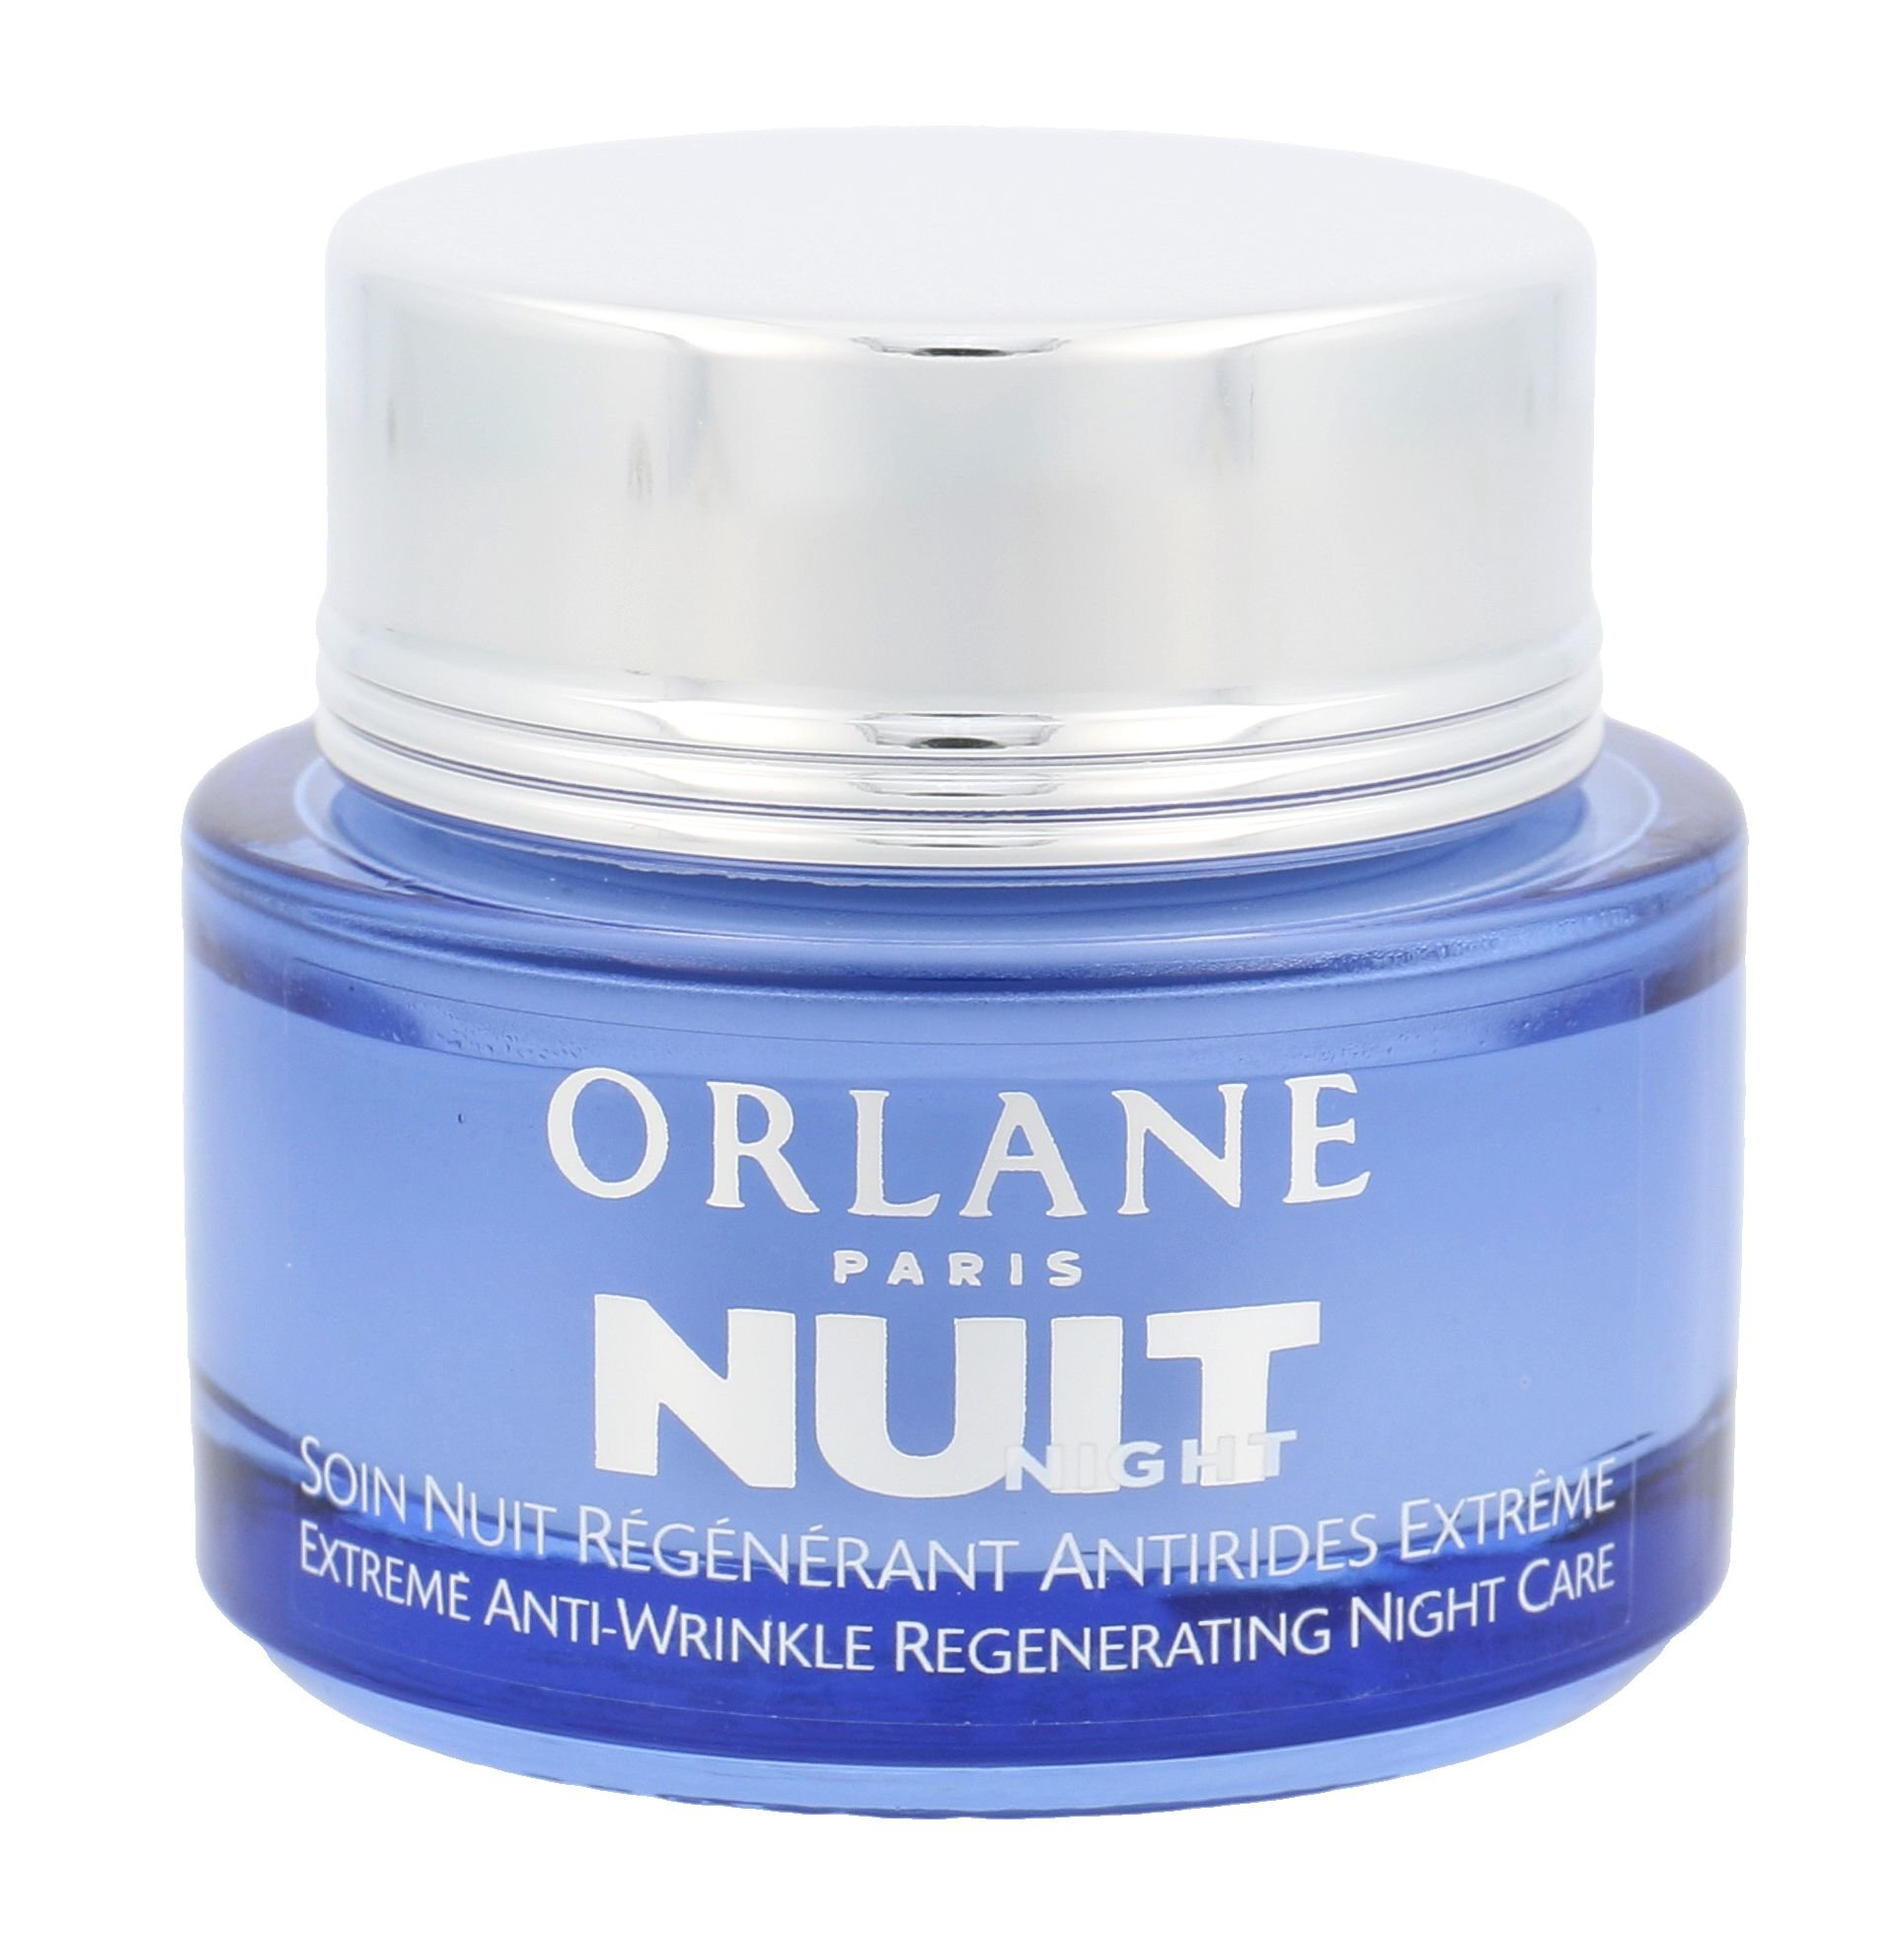 Orlane Extreme Line-Reducing Cosmetic 50ml  Extreme Anti-Wrinkle Regenerating Night Care